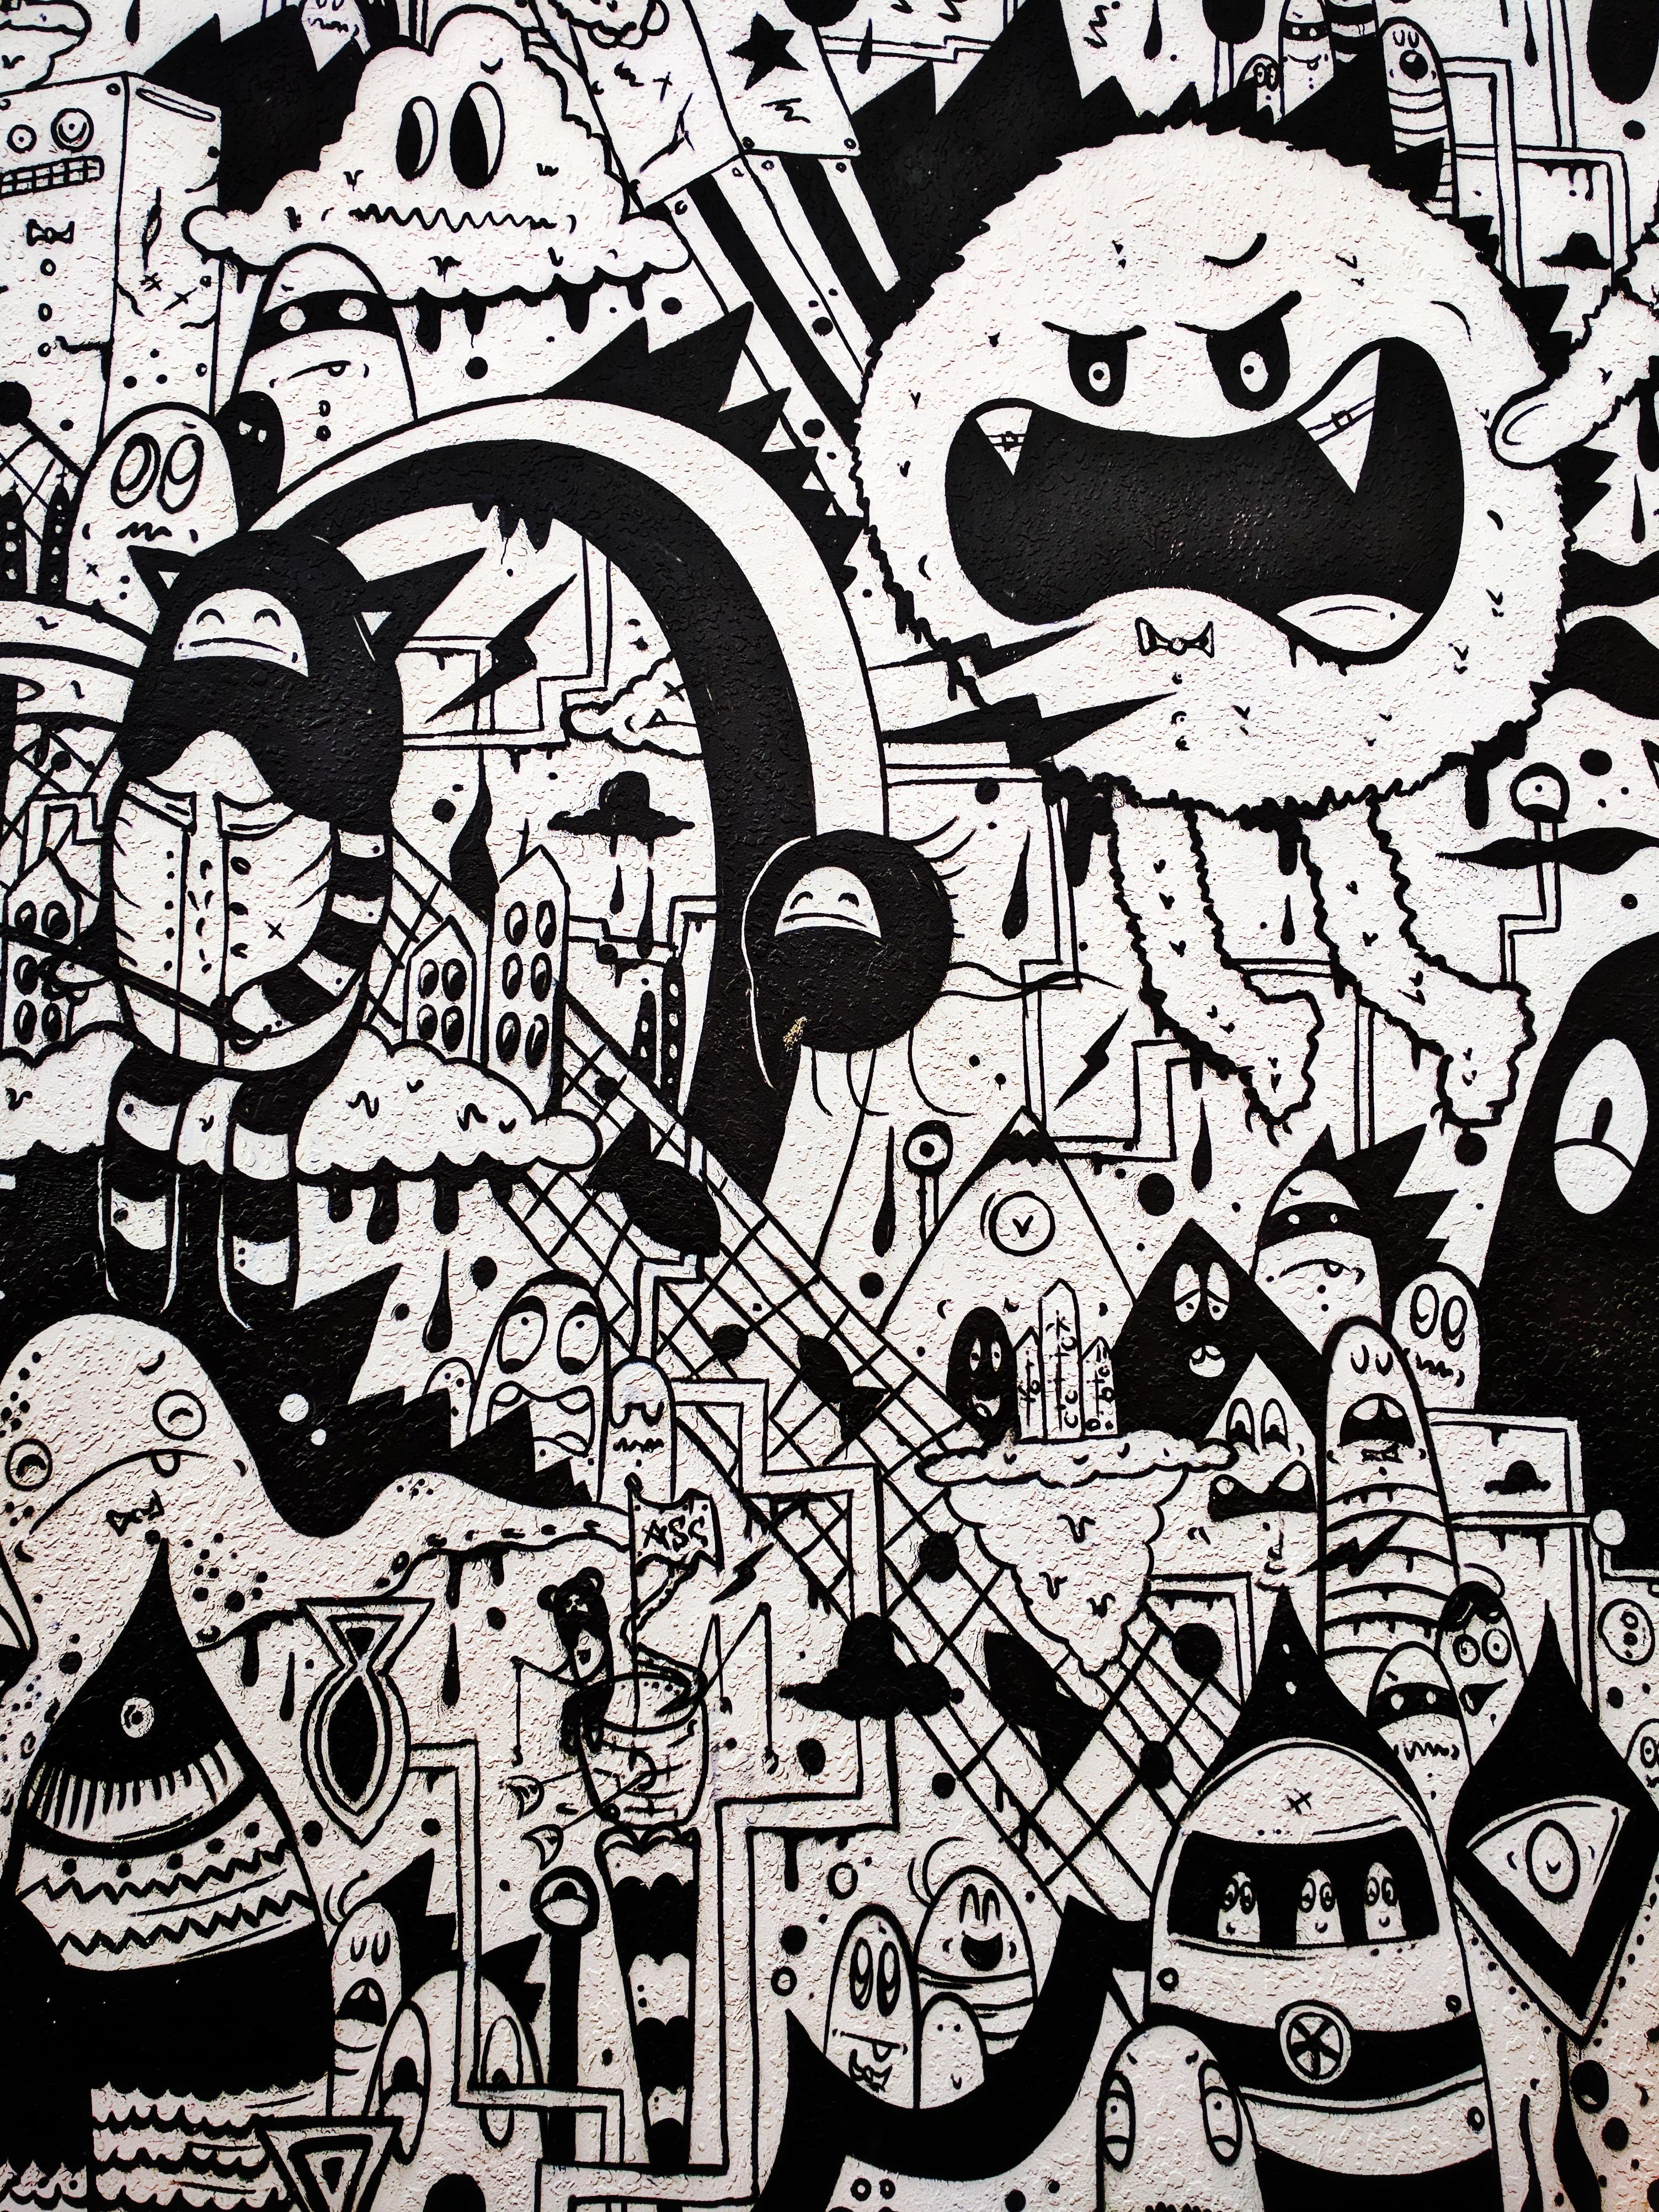 Rena Disaster, mural detail (Steeple Lane, Mauao, Aotearoa)